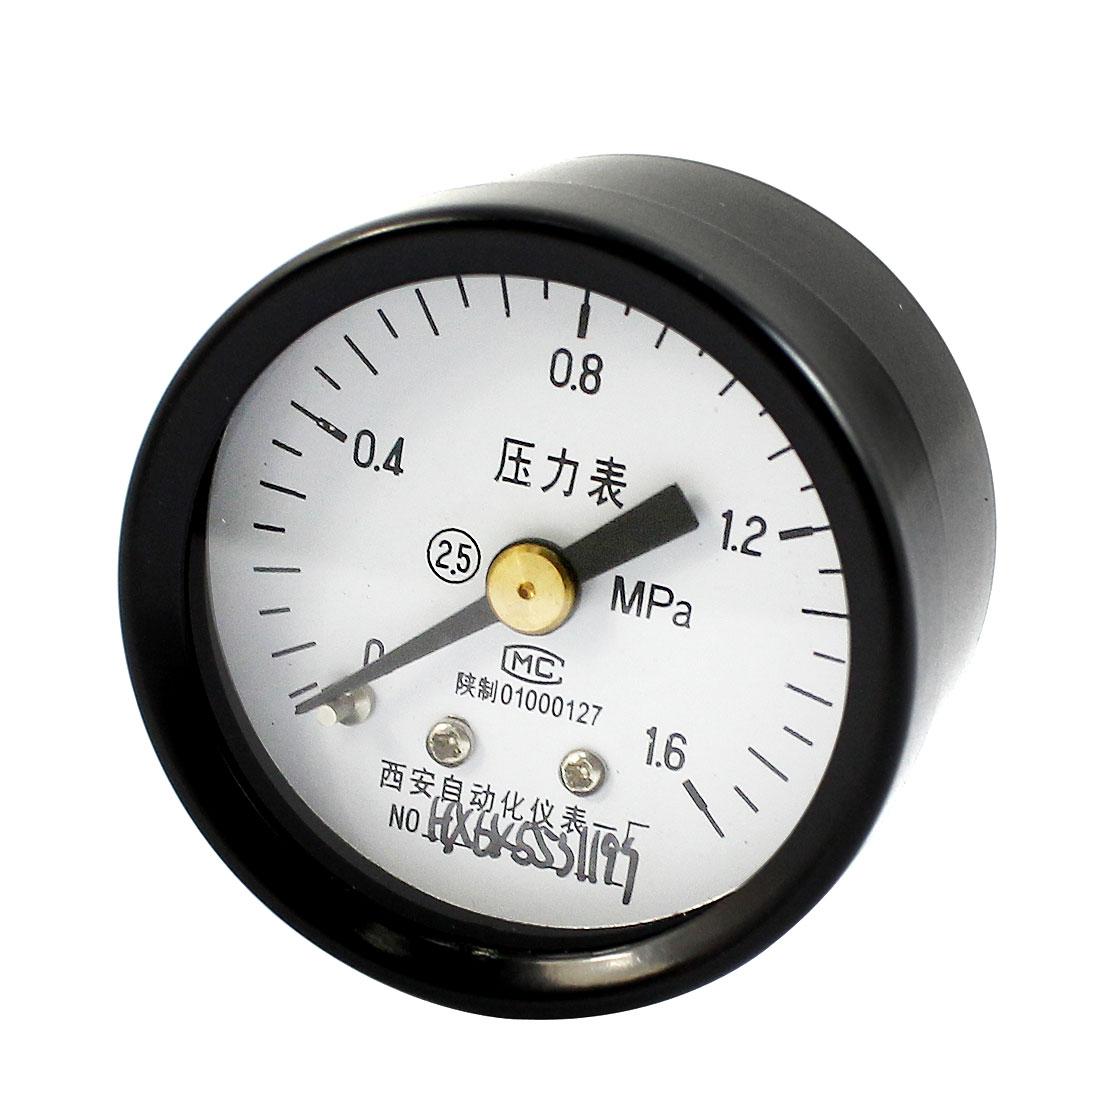 1/8PT Threaded 0-1.6Mpa Arabic Number Dial Pneumatic Air Pressure Gauge